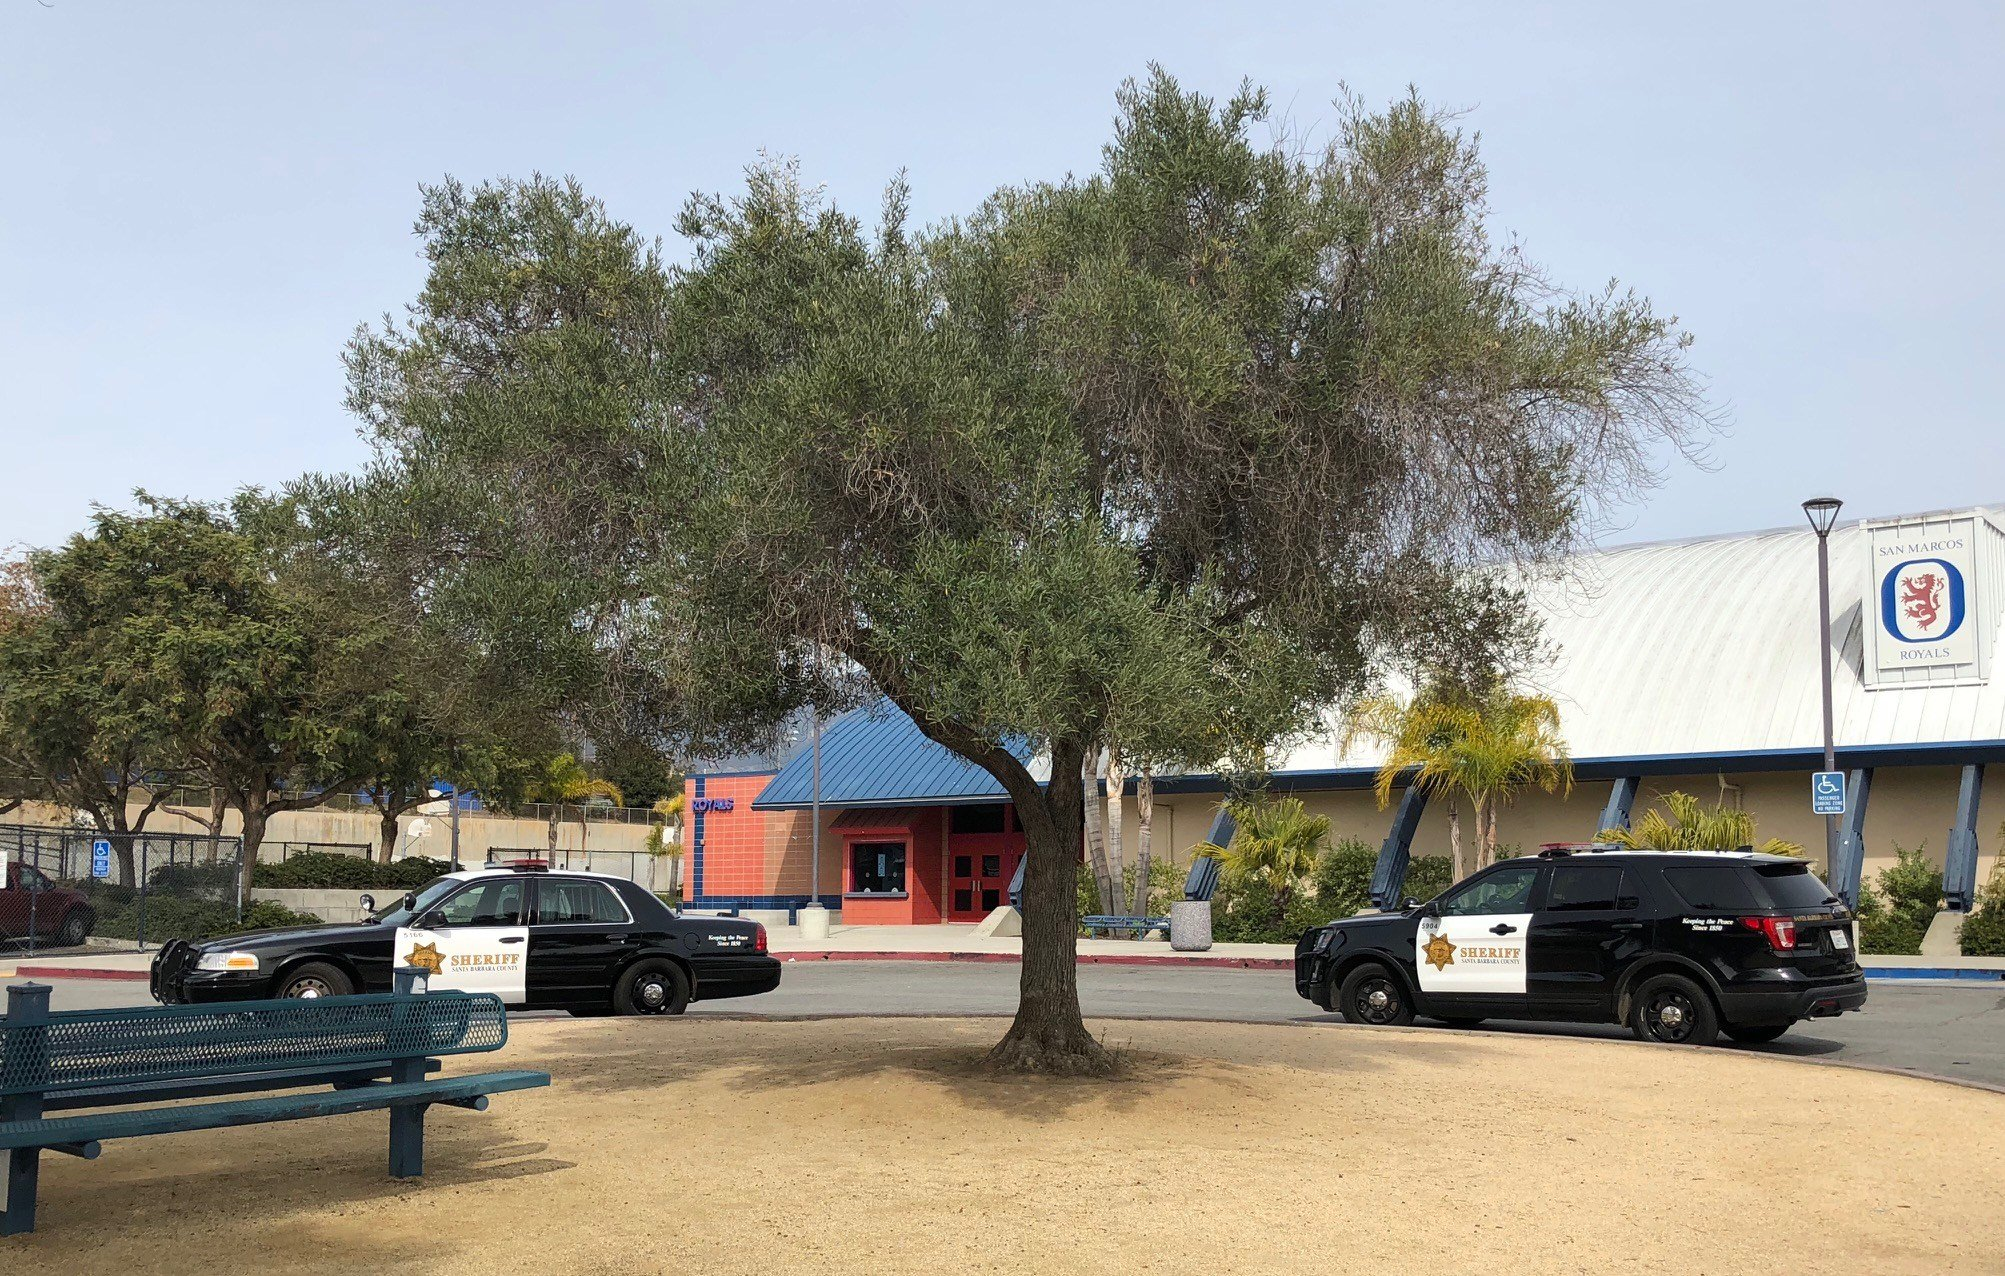 Threatening graffiti found Friday at San Marcos High School - KSBY ...